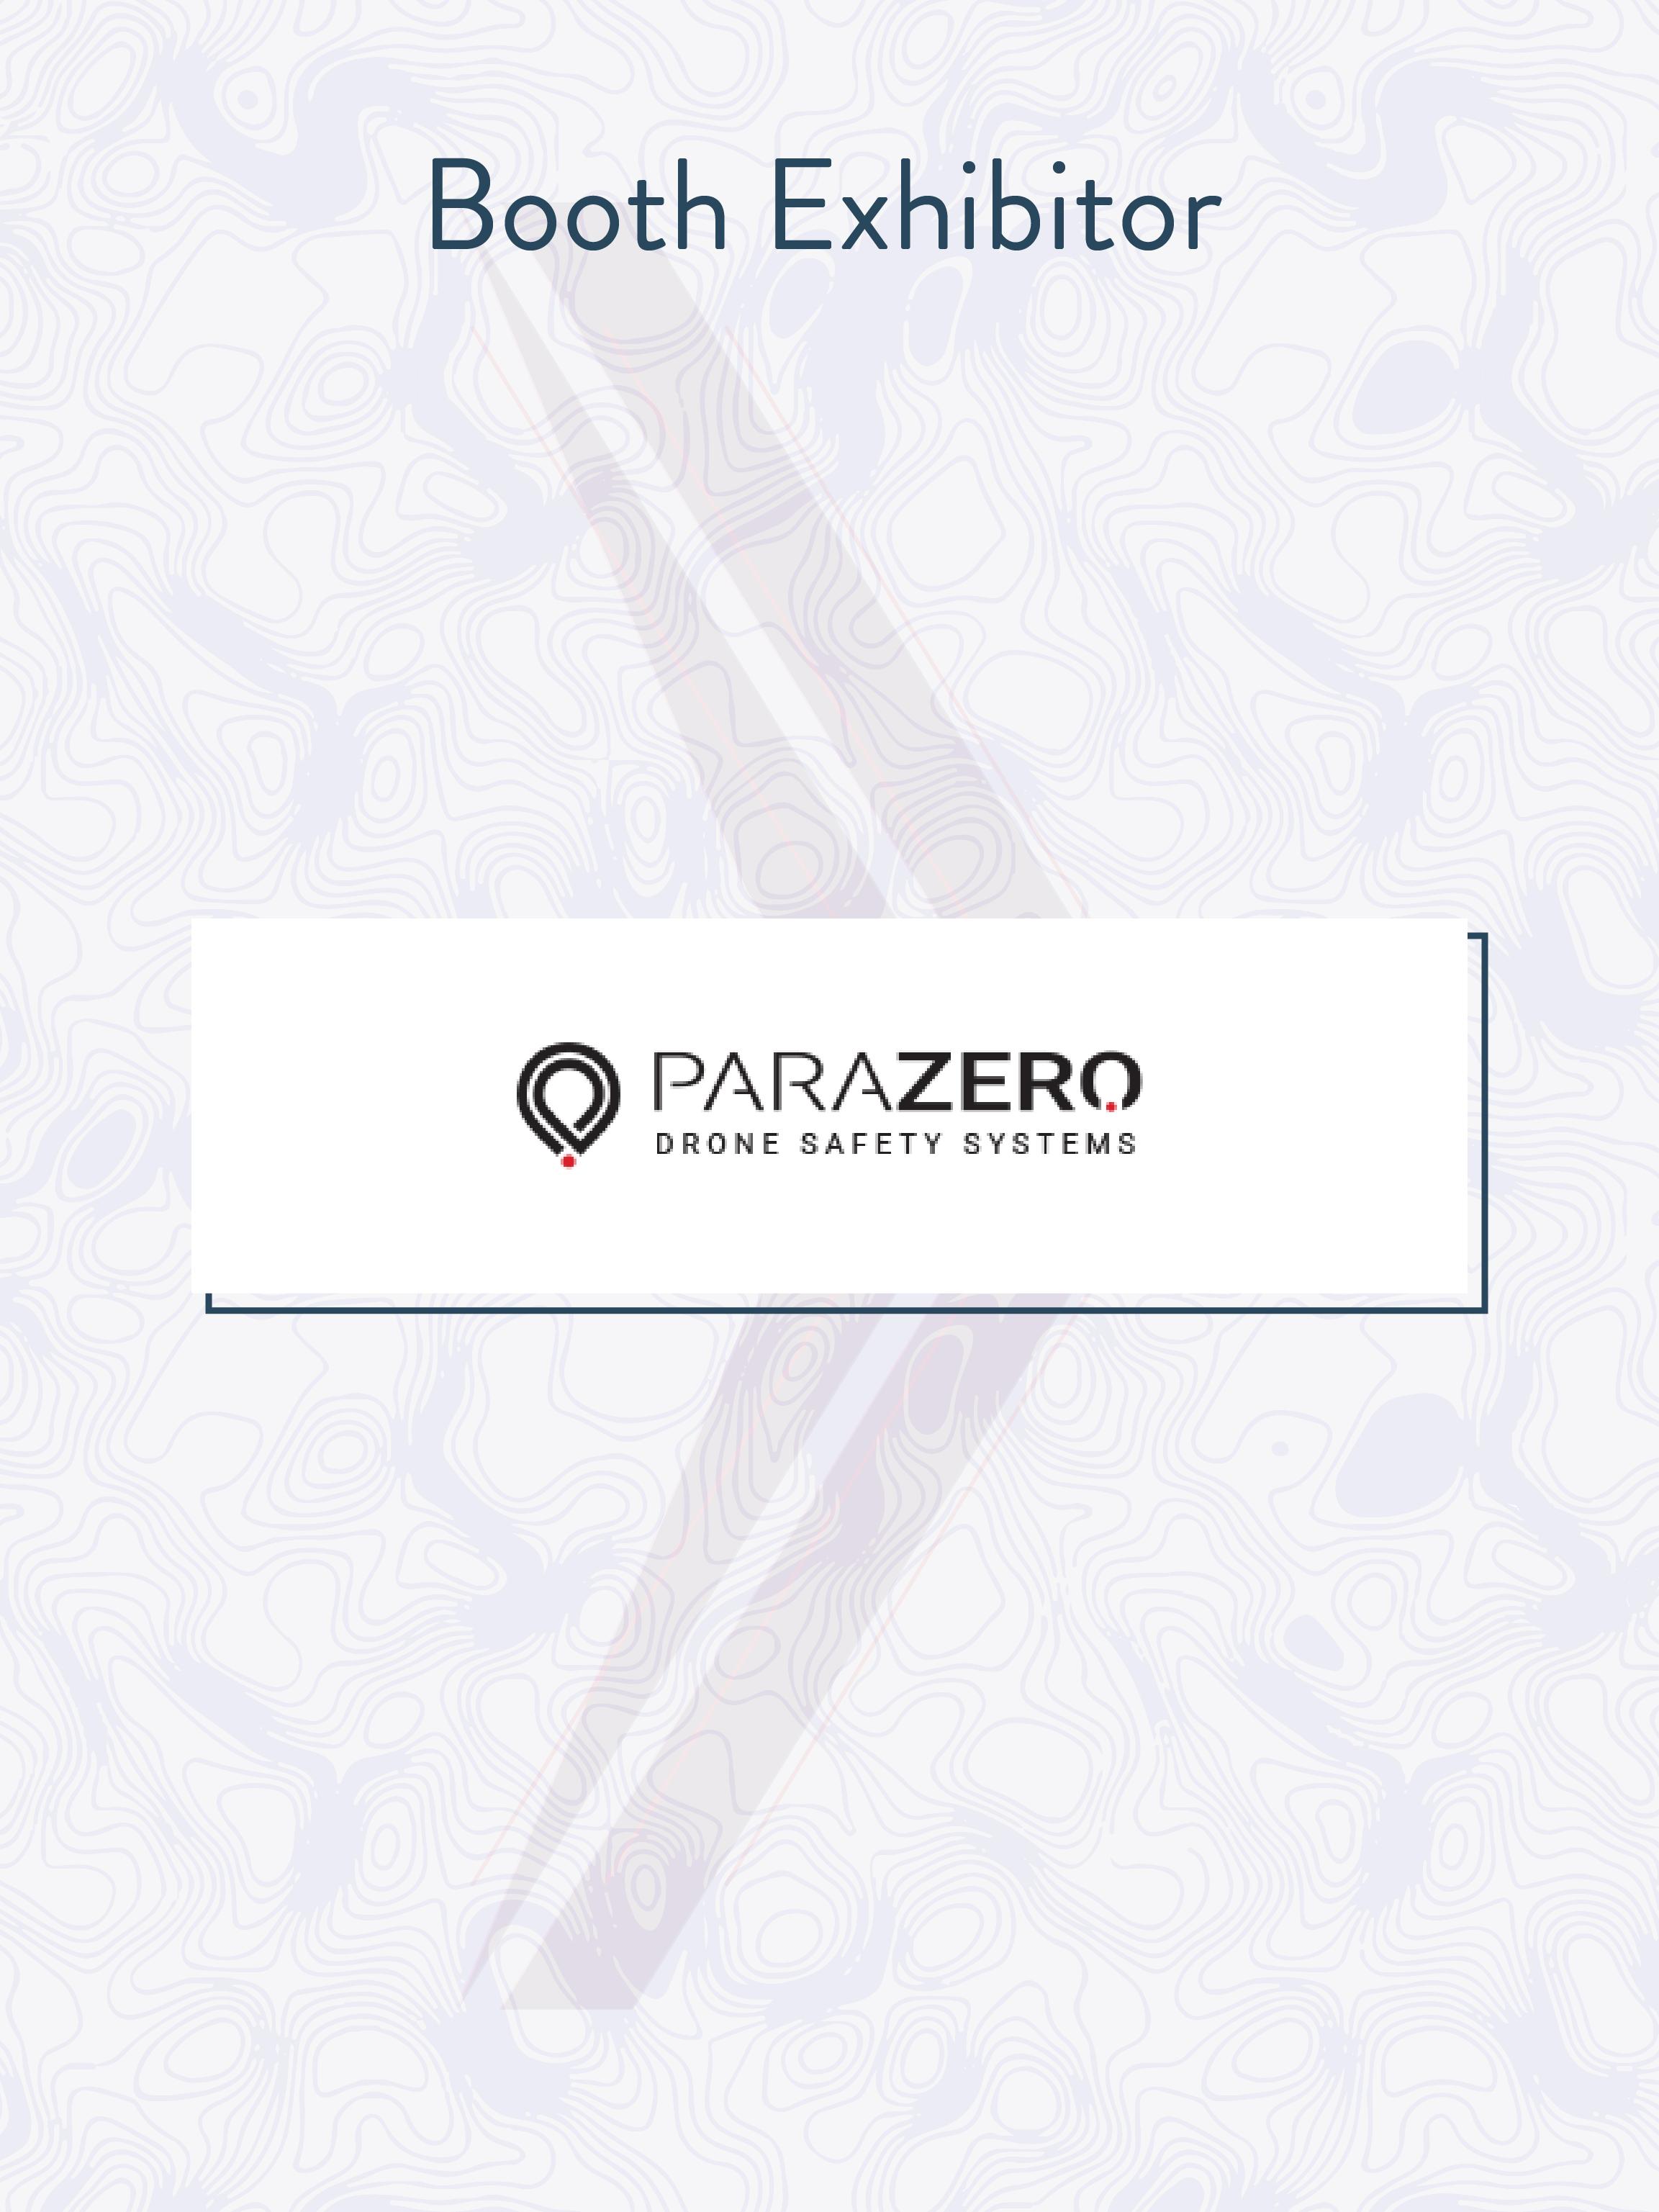 Parazero.jpg